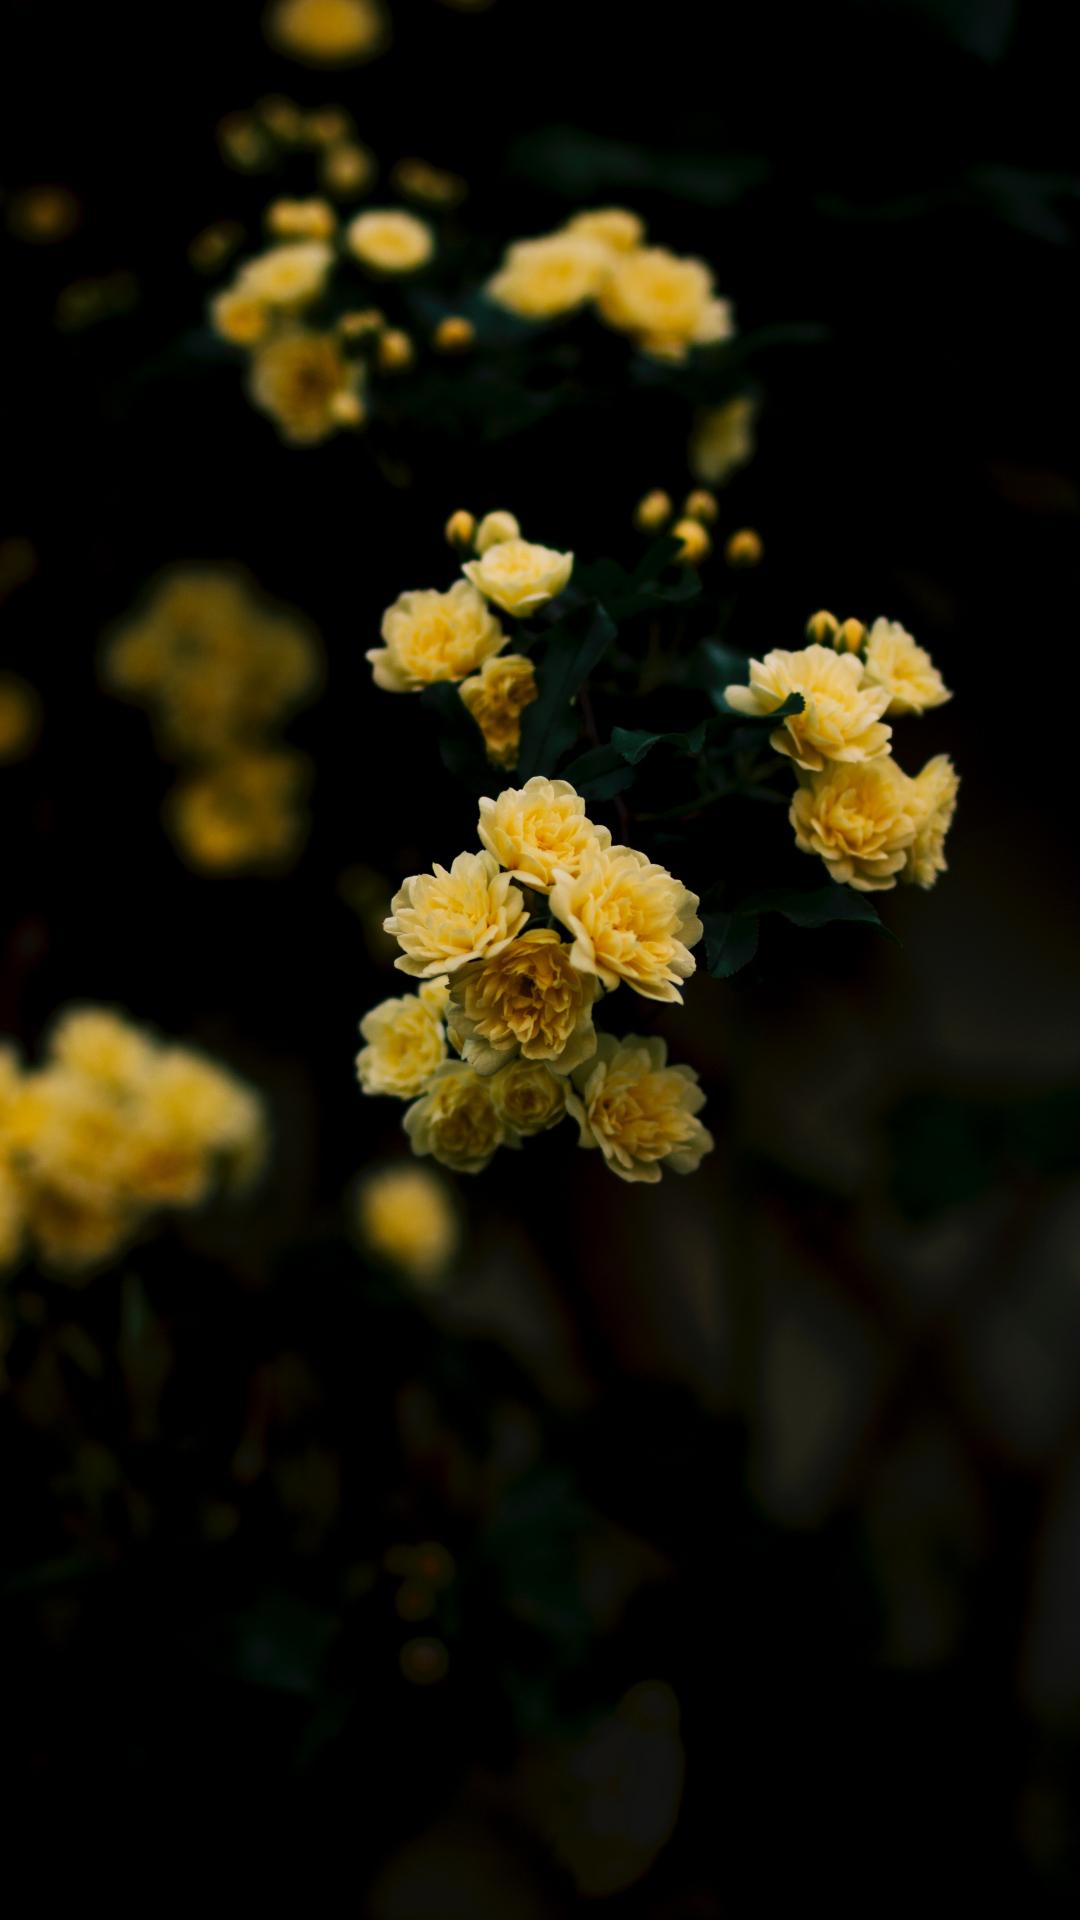 Yellow Rose Iphone Wallpaper Yellow Aesthetic Wallpaper Rose 1080x1920 Wallpaper Teahub Io